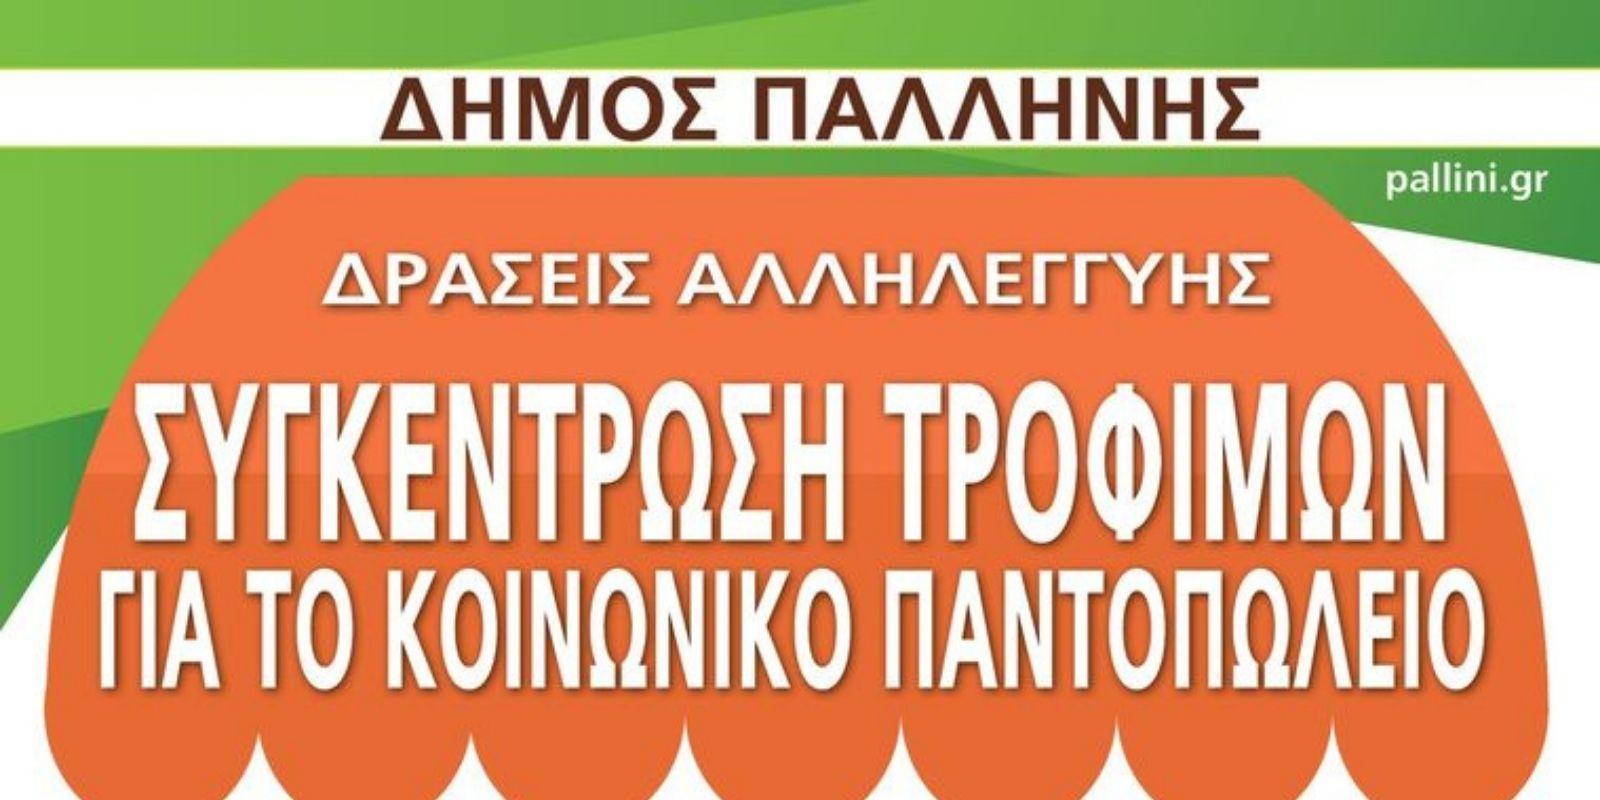 You are currently viewing Συγκέντρωση τροφίμων για το κοινωνικό παντοπωλείο Δήμου Παλλήνης